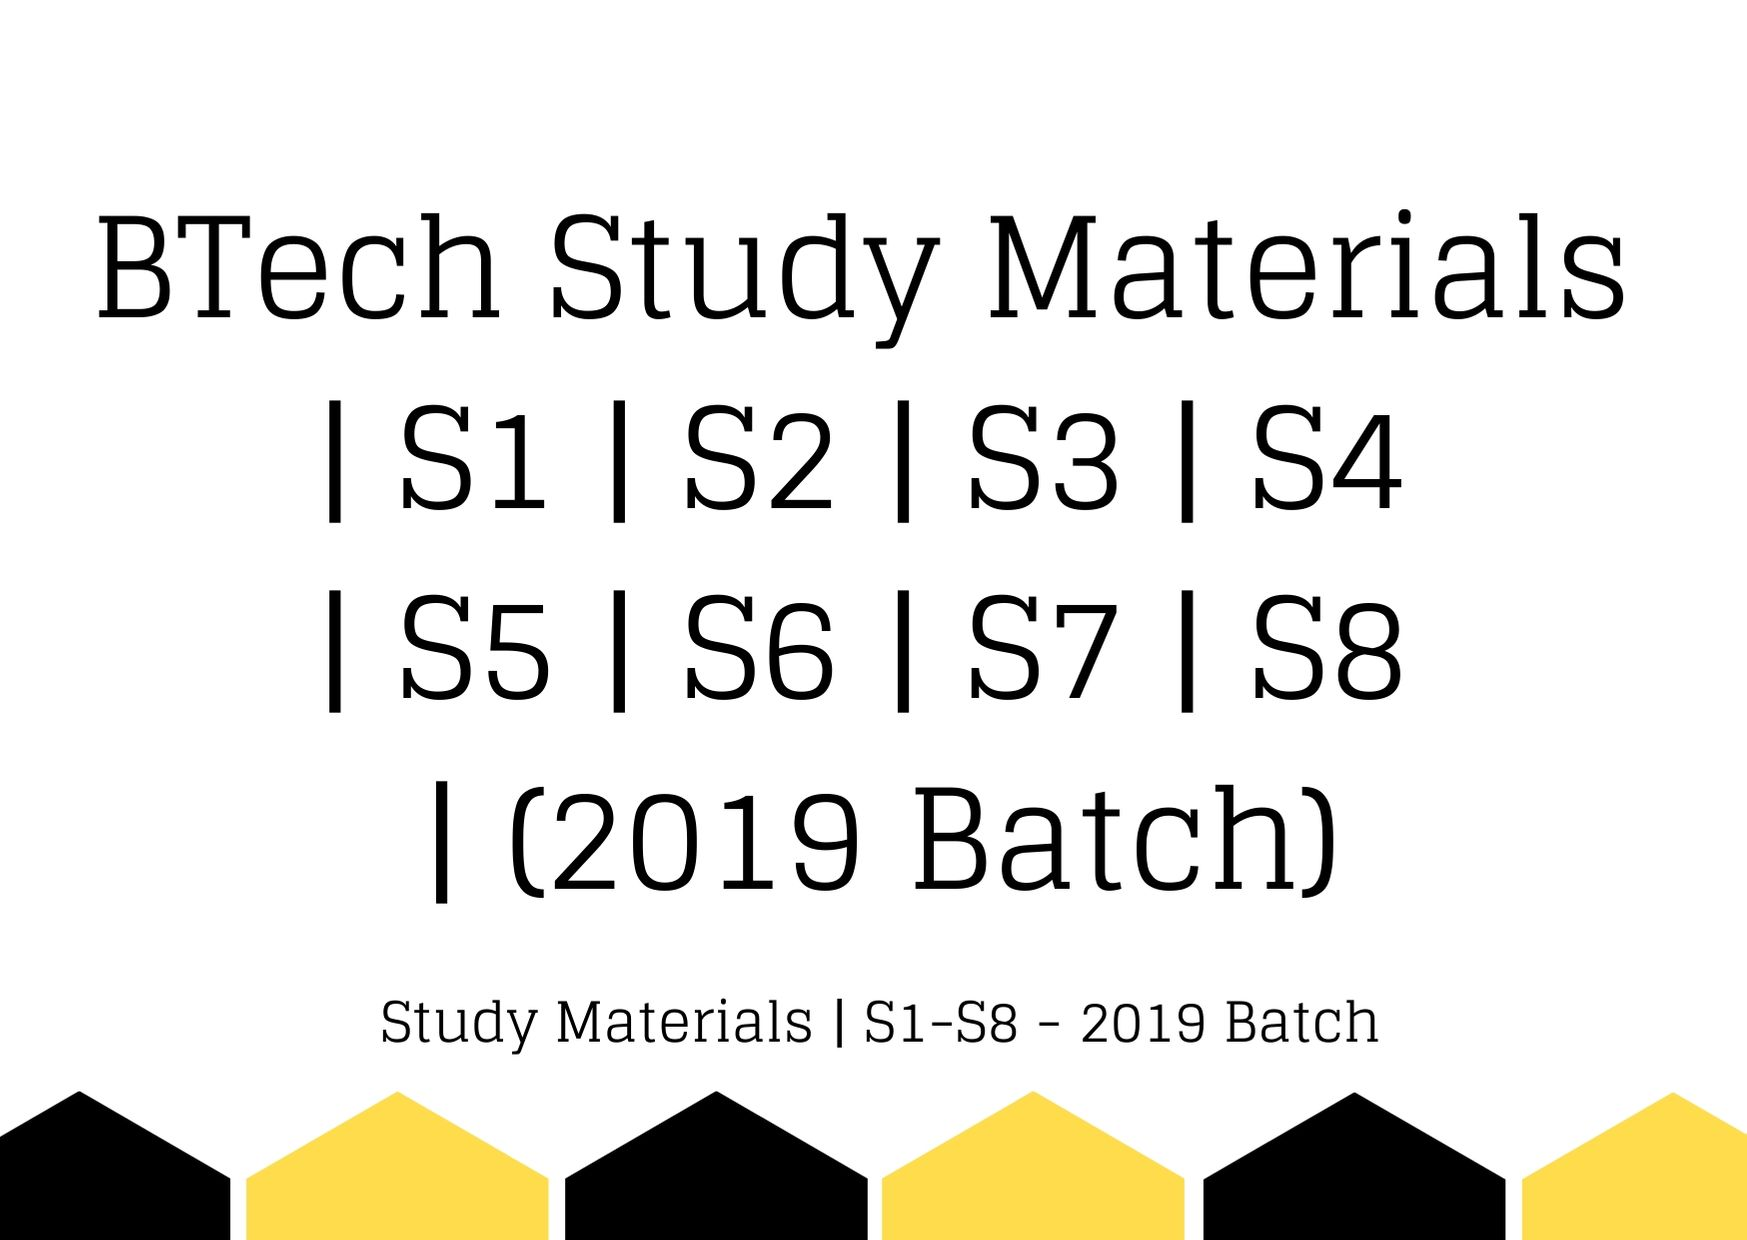 BTech Study Materials | S1 | S2 | S3 | S4 | S5 | S6 | S7 | S8 | (2019 Batch)